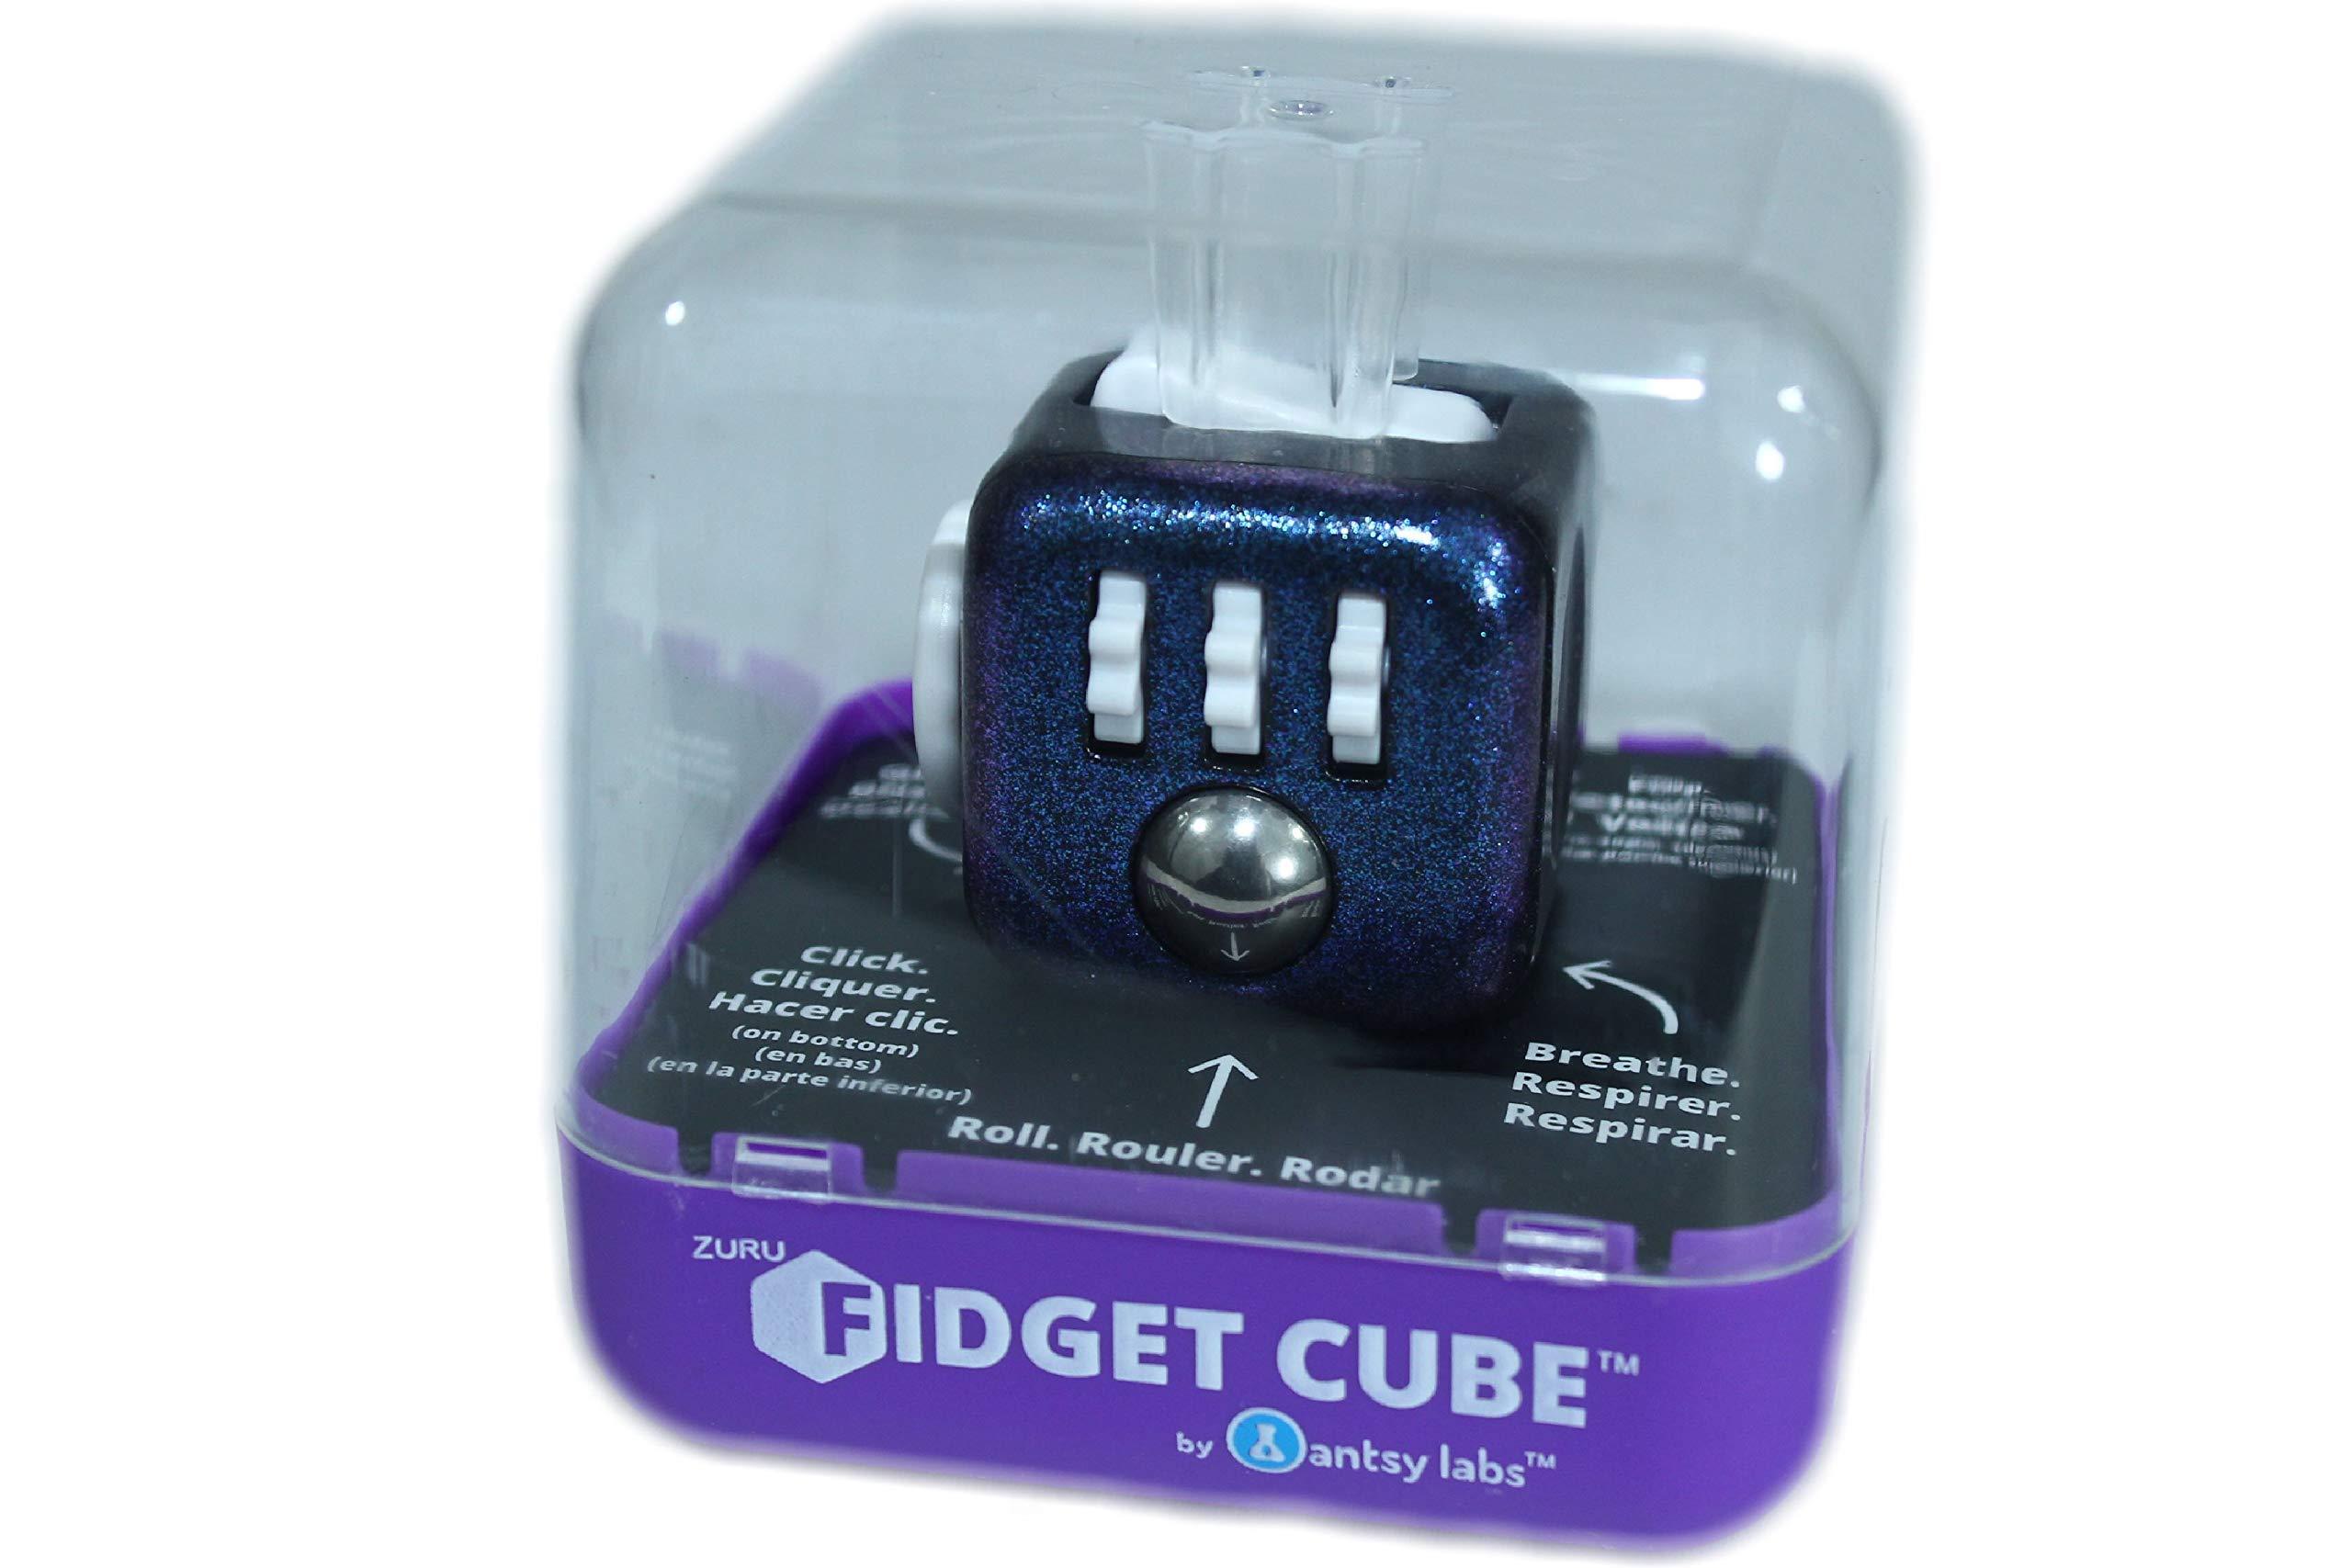 Zuru Fidget Cube by Antsy Labs - Custom Series (Chameleon Paint) Purple Glitter Fidget Cube with White Accents by Zuru Fidget Cube by Antsy Labs (Image #1)